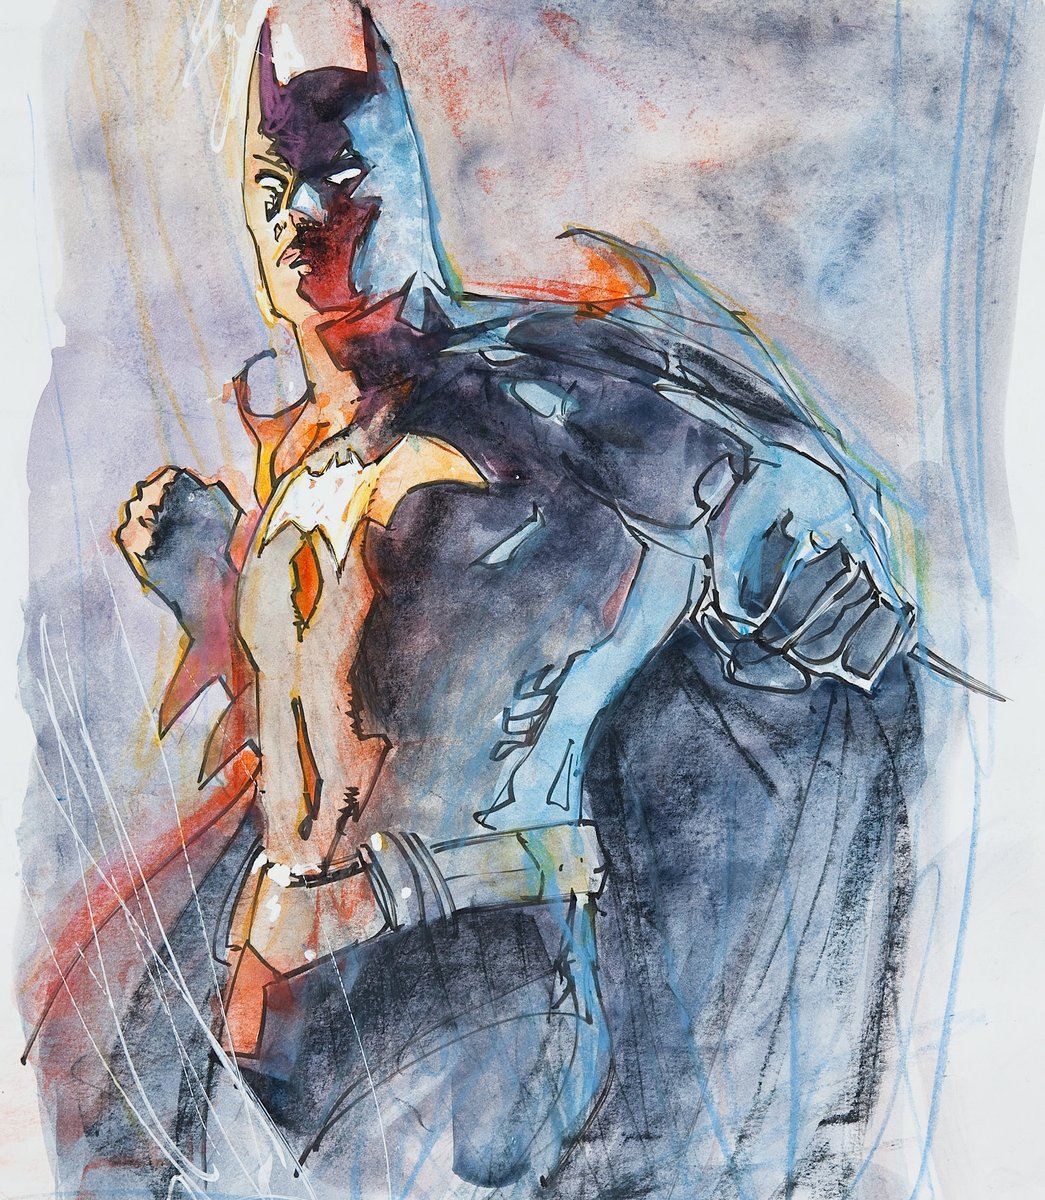 Batman #batman #painting #art #comicartist #dccomics #fridayfeeling